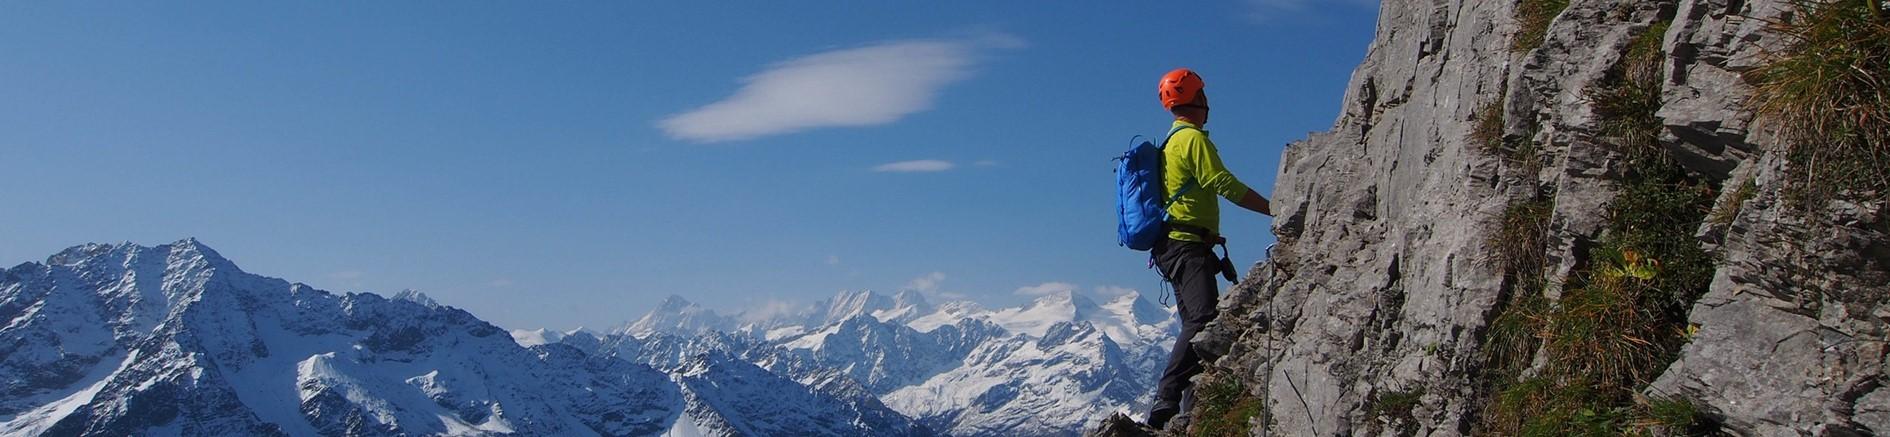 Fertige Klettersteigsets